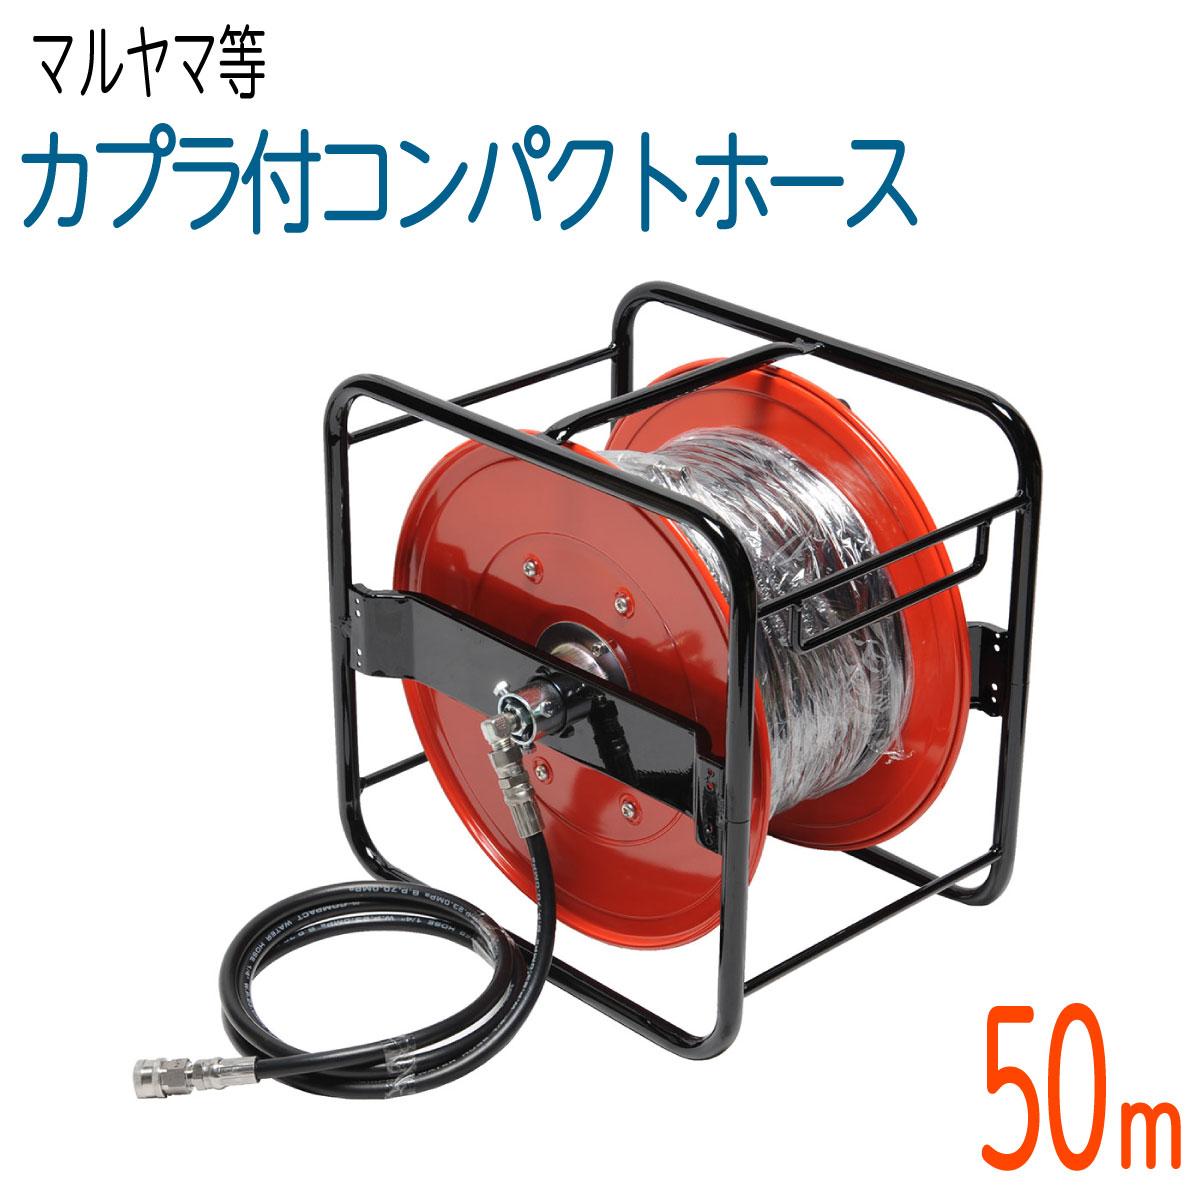 50Mリール巻き 1 4 日本全国 送料無料 2分 高圧洗浄機ホース トレンド コンパクトホース ワンタッチカプラ付